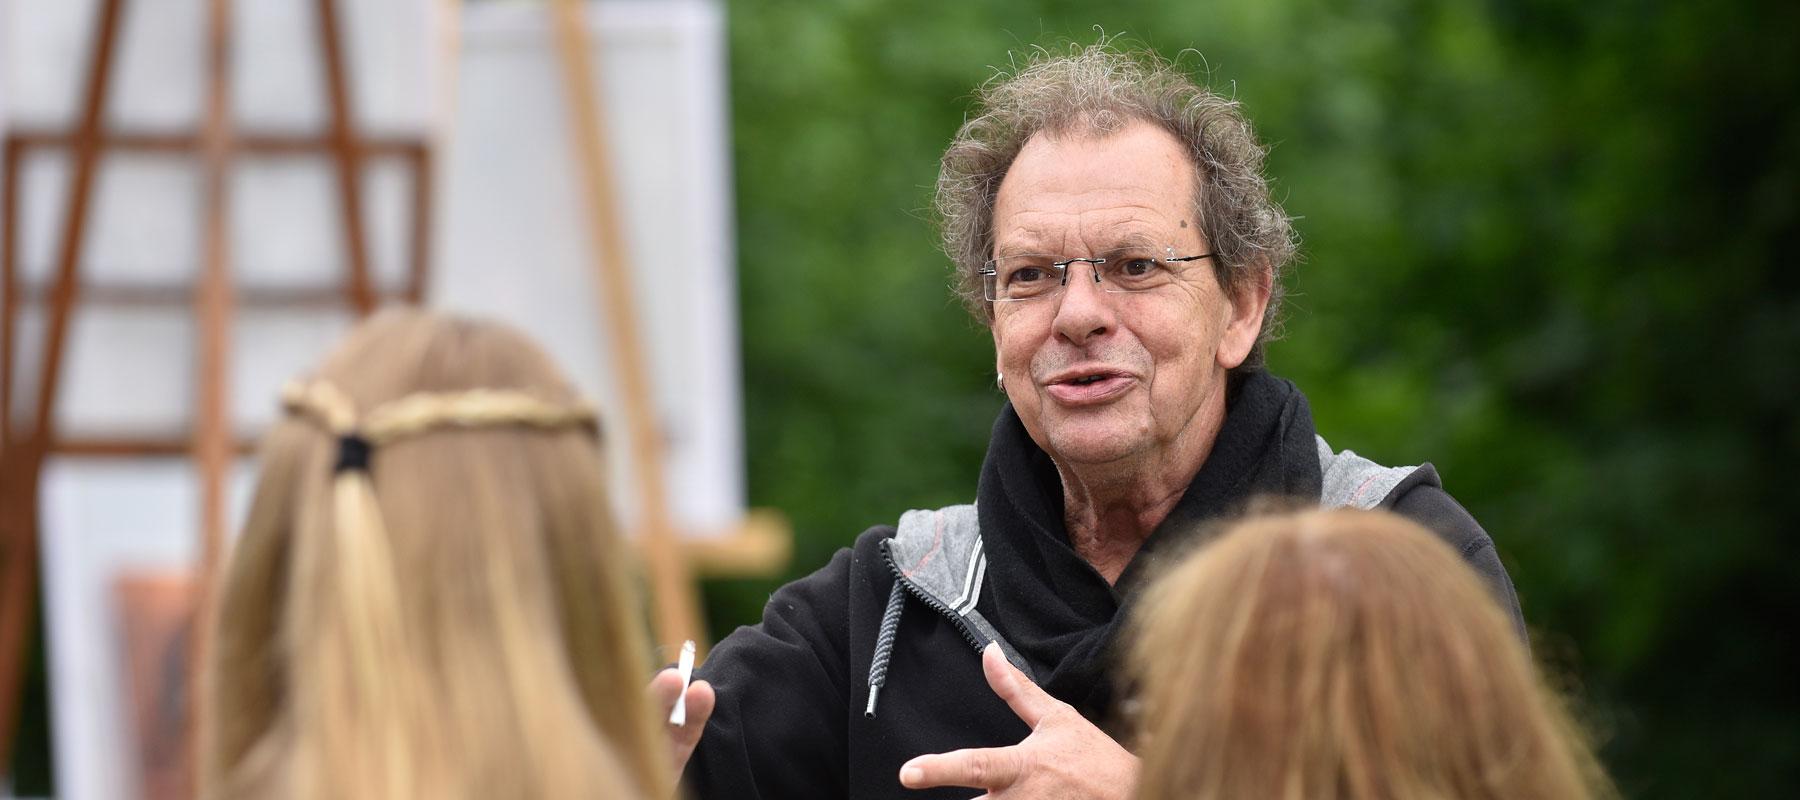 Paul Siemt als Regisseur